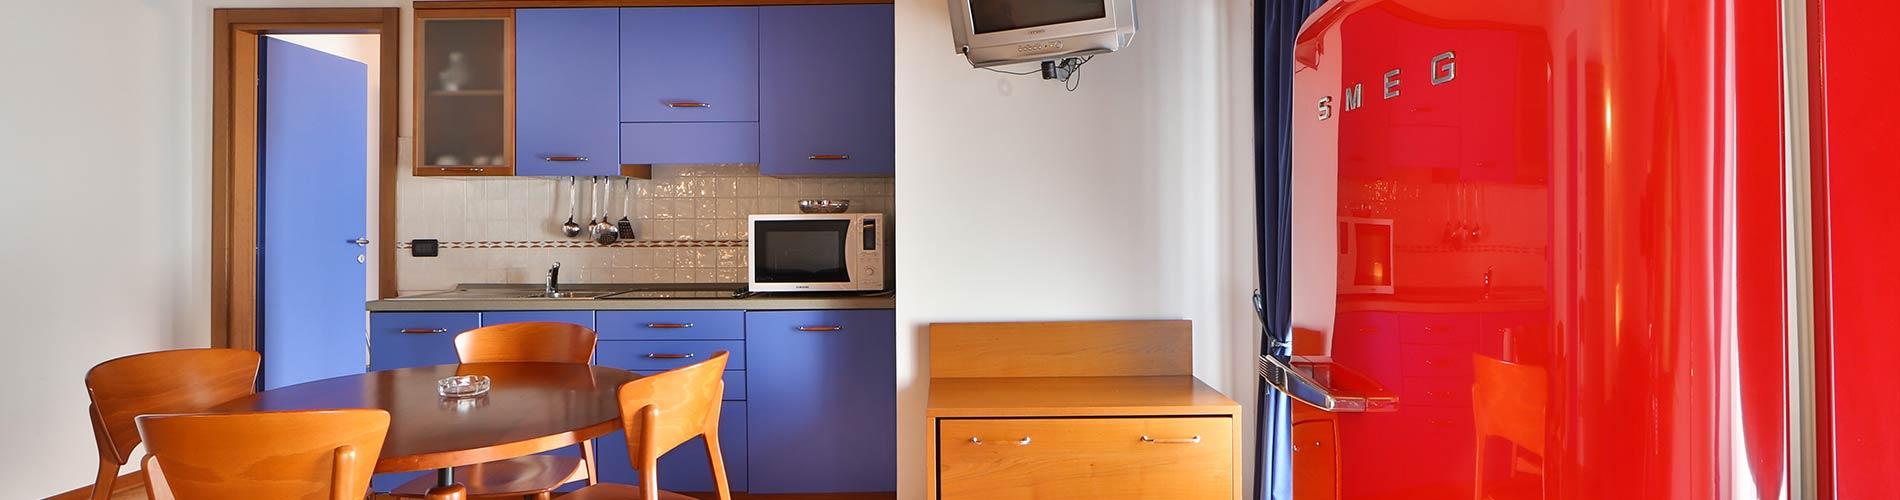 Residence-San-Giusto-Trieste-h3